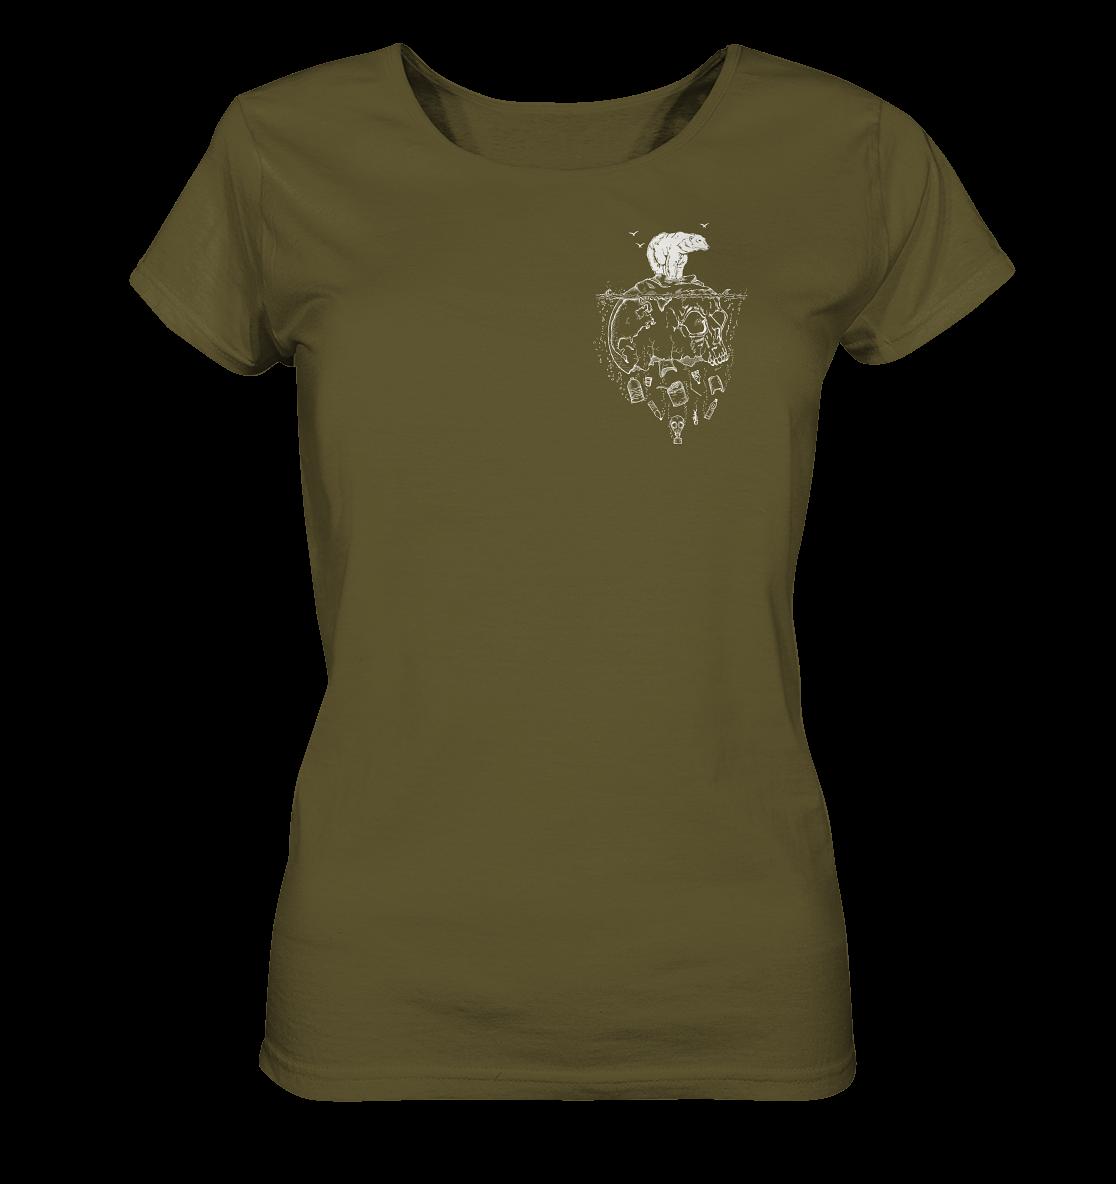 front-ladies-organic-shirt-5e5530-1116x-16.png